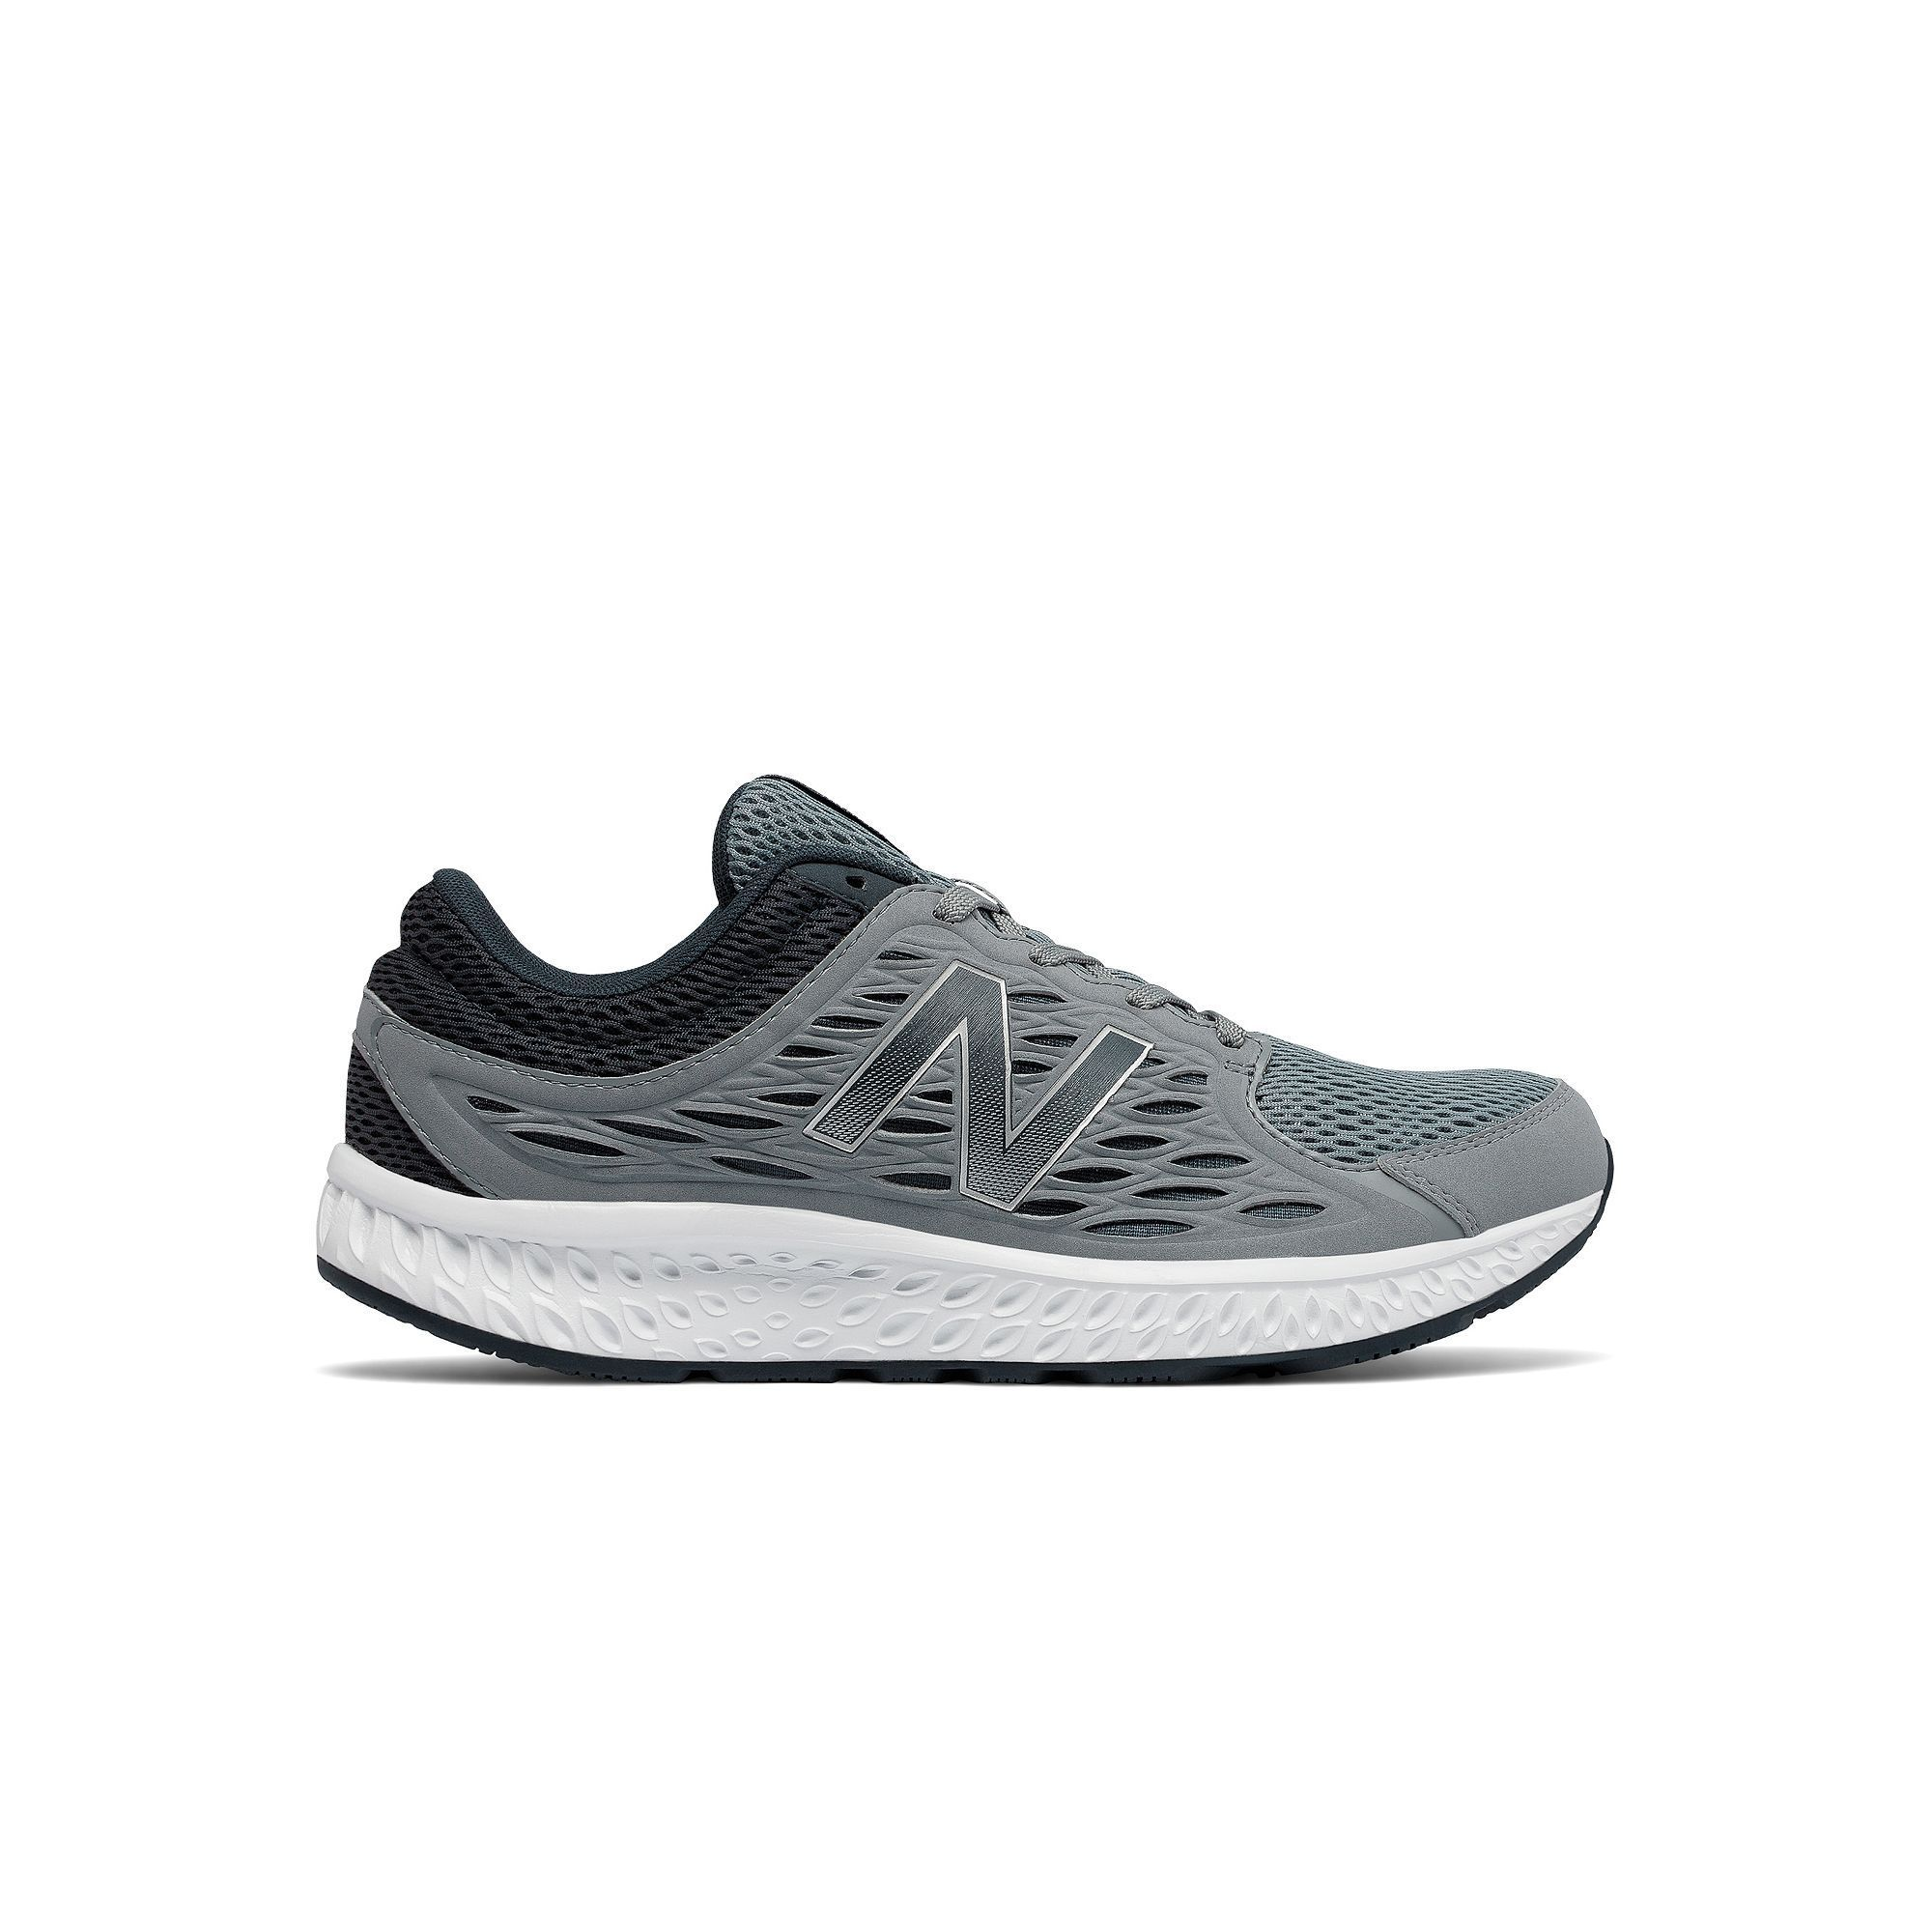 6323e864cf95e New Balance 420 v3 Men s Running Shoes